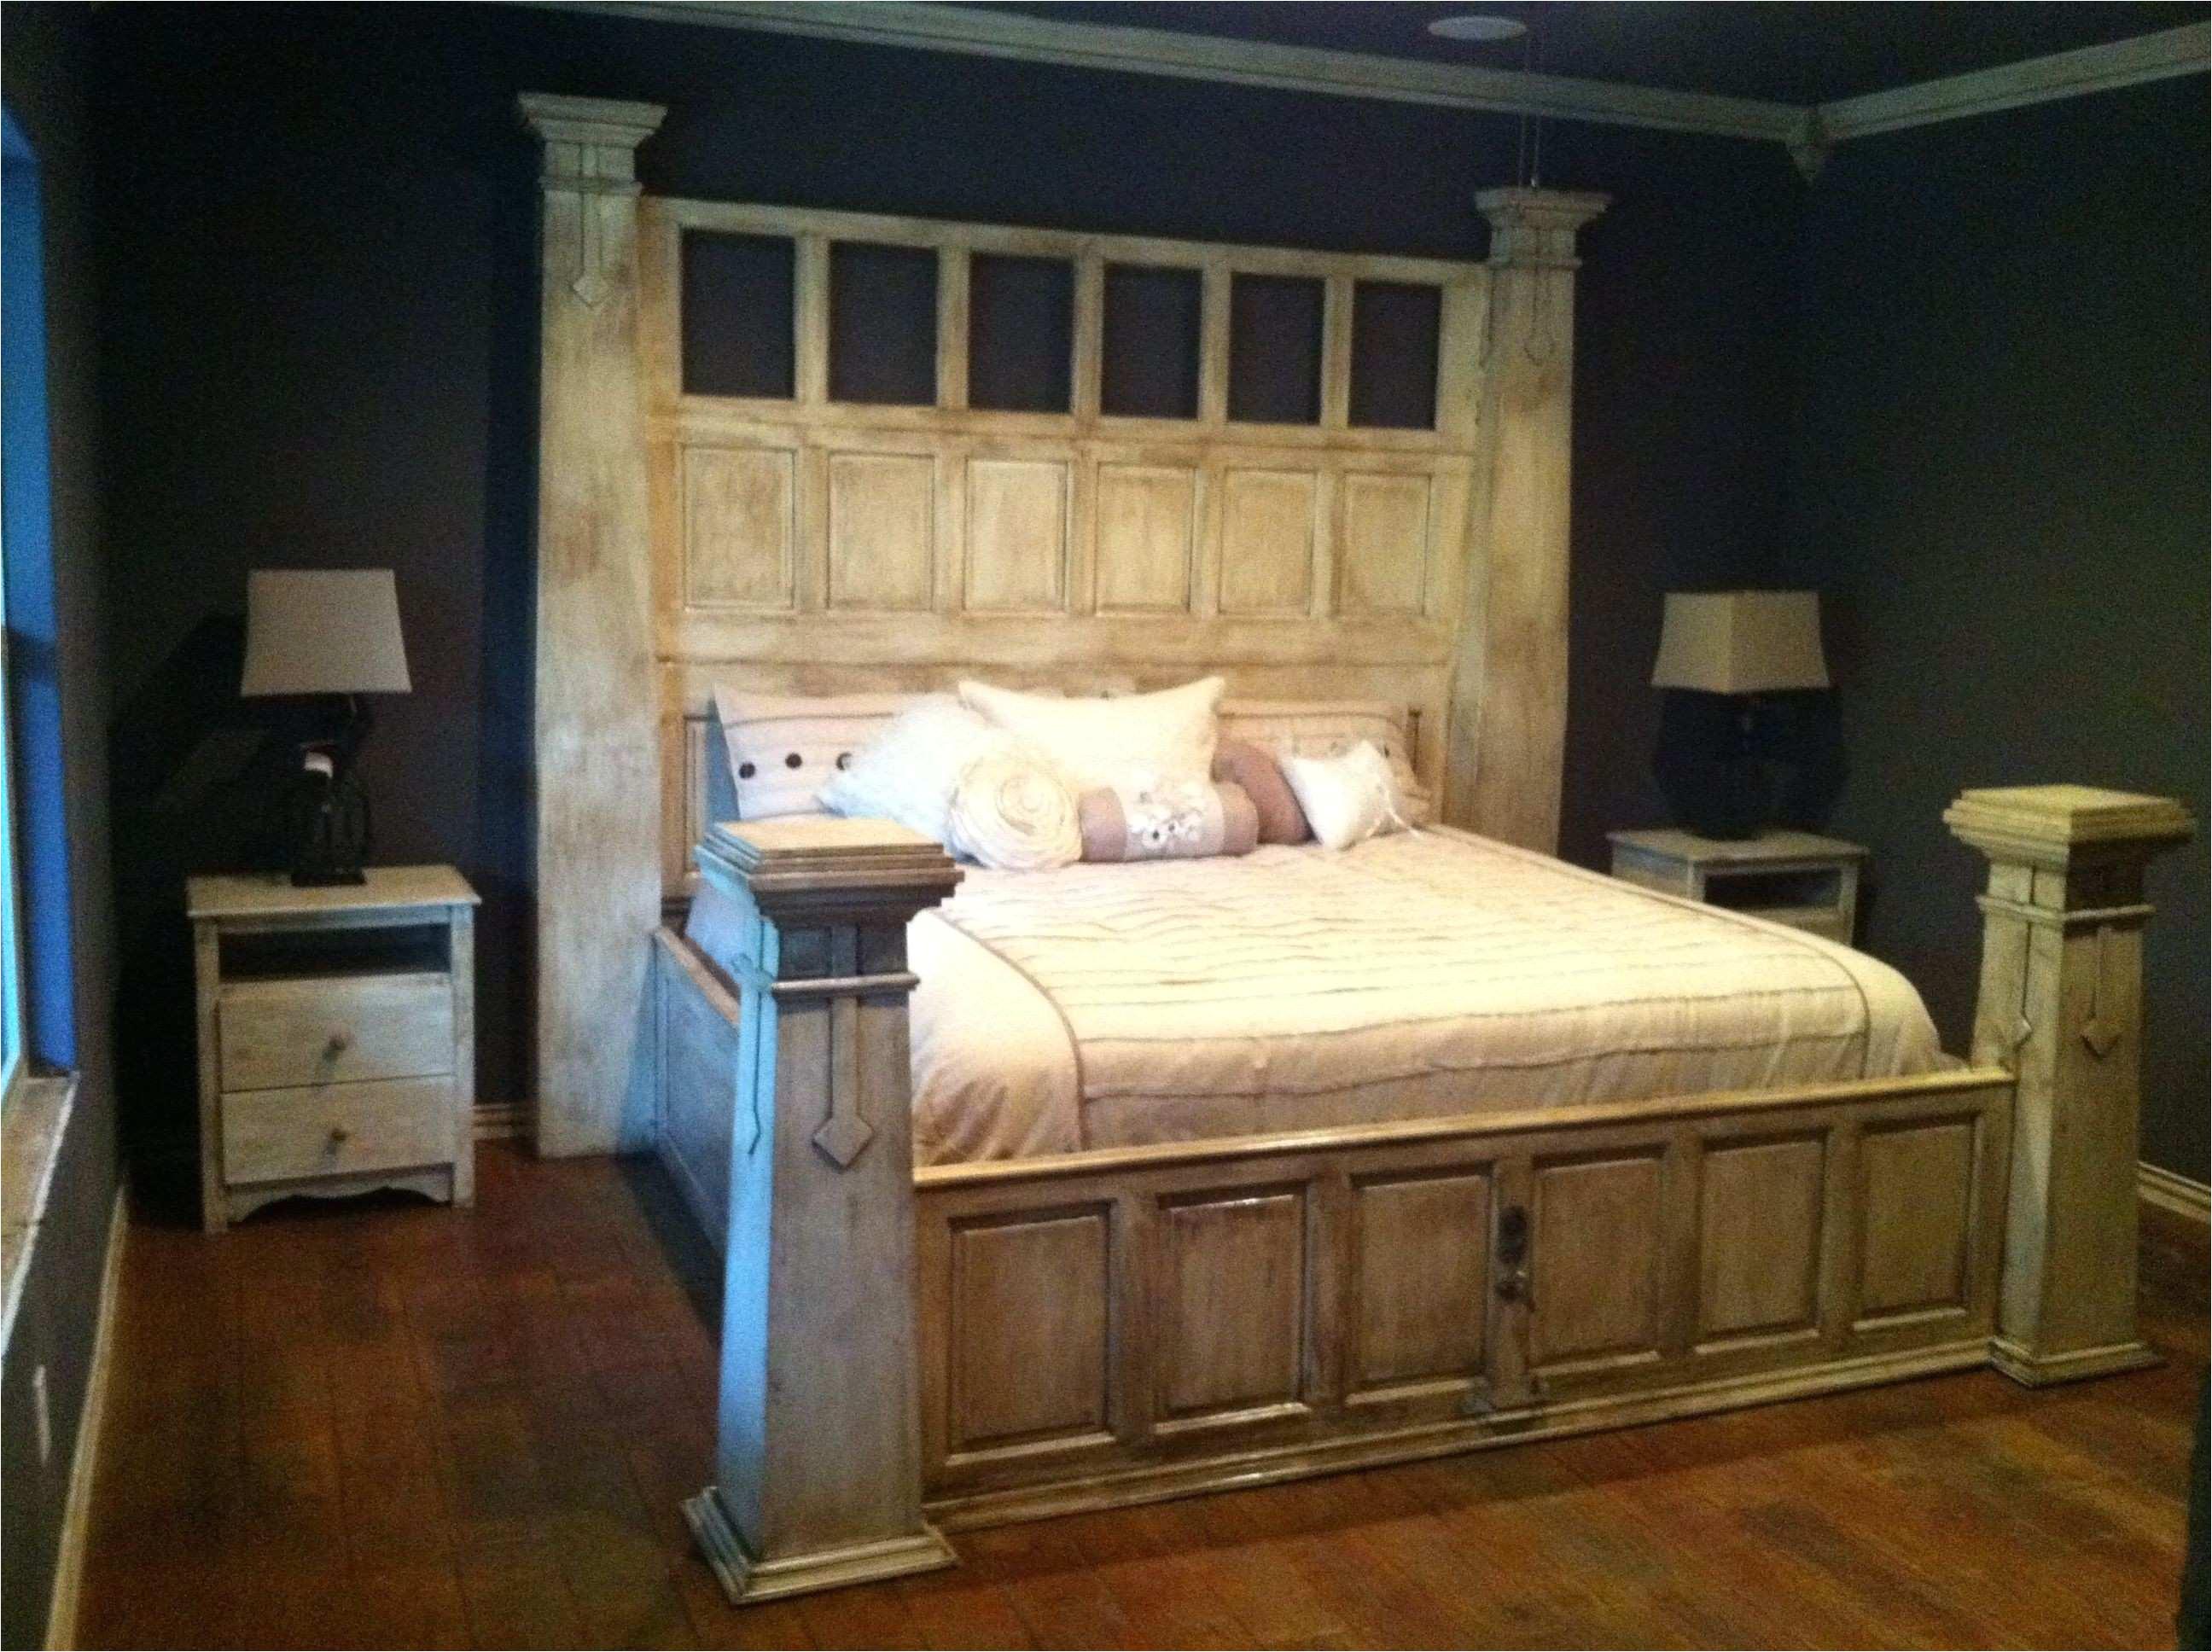 Alaskan King Size Bed Dimensions Eastern King Bed Frame Unique Alaskan King Bed Size King Bed Size